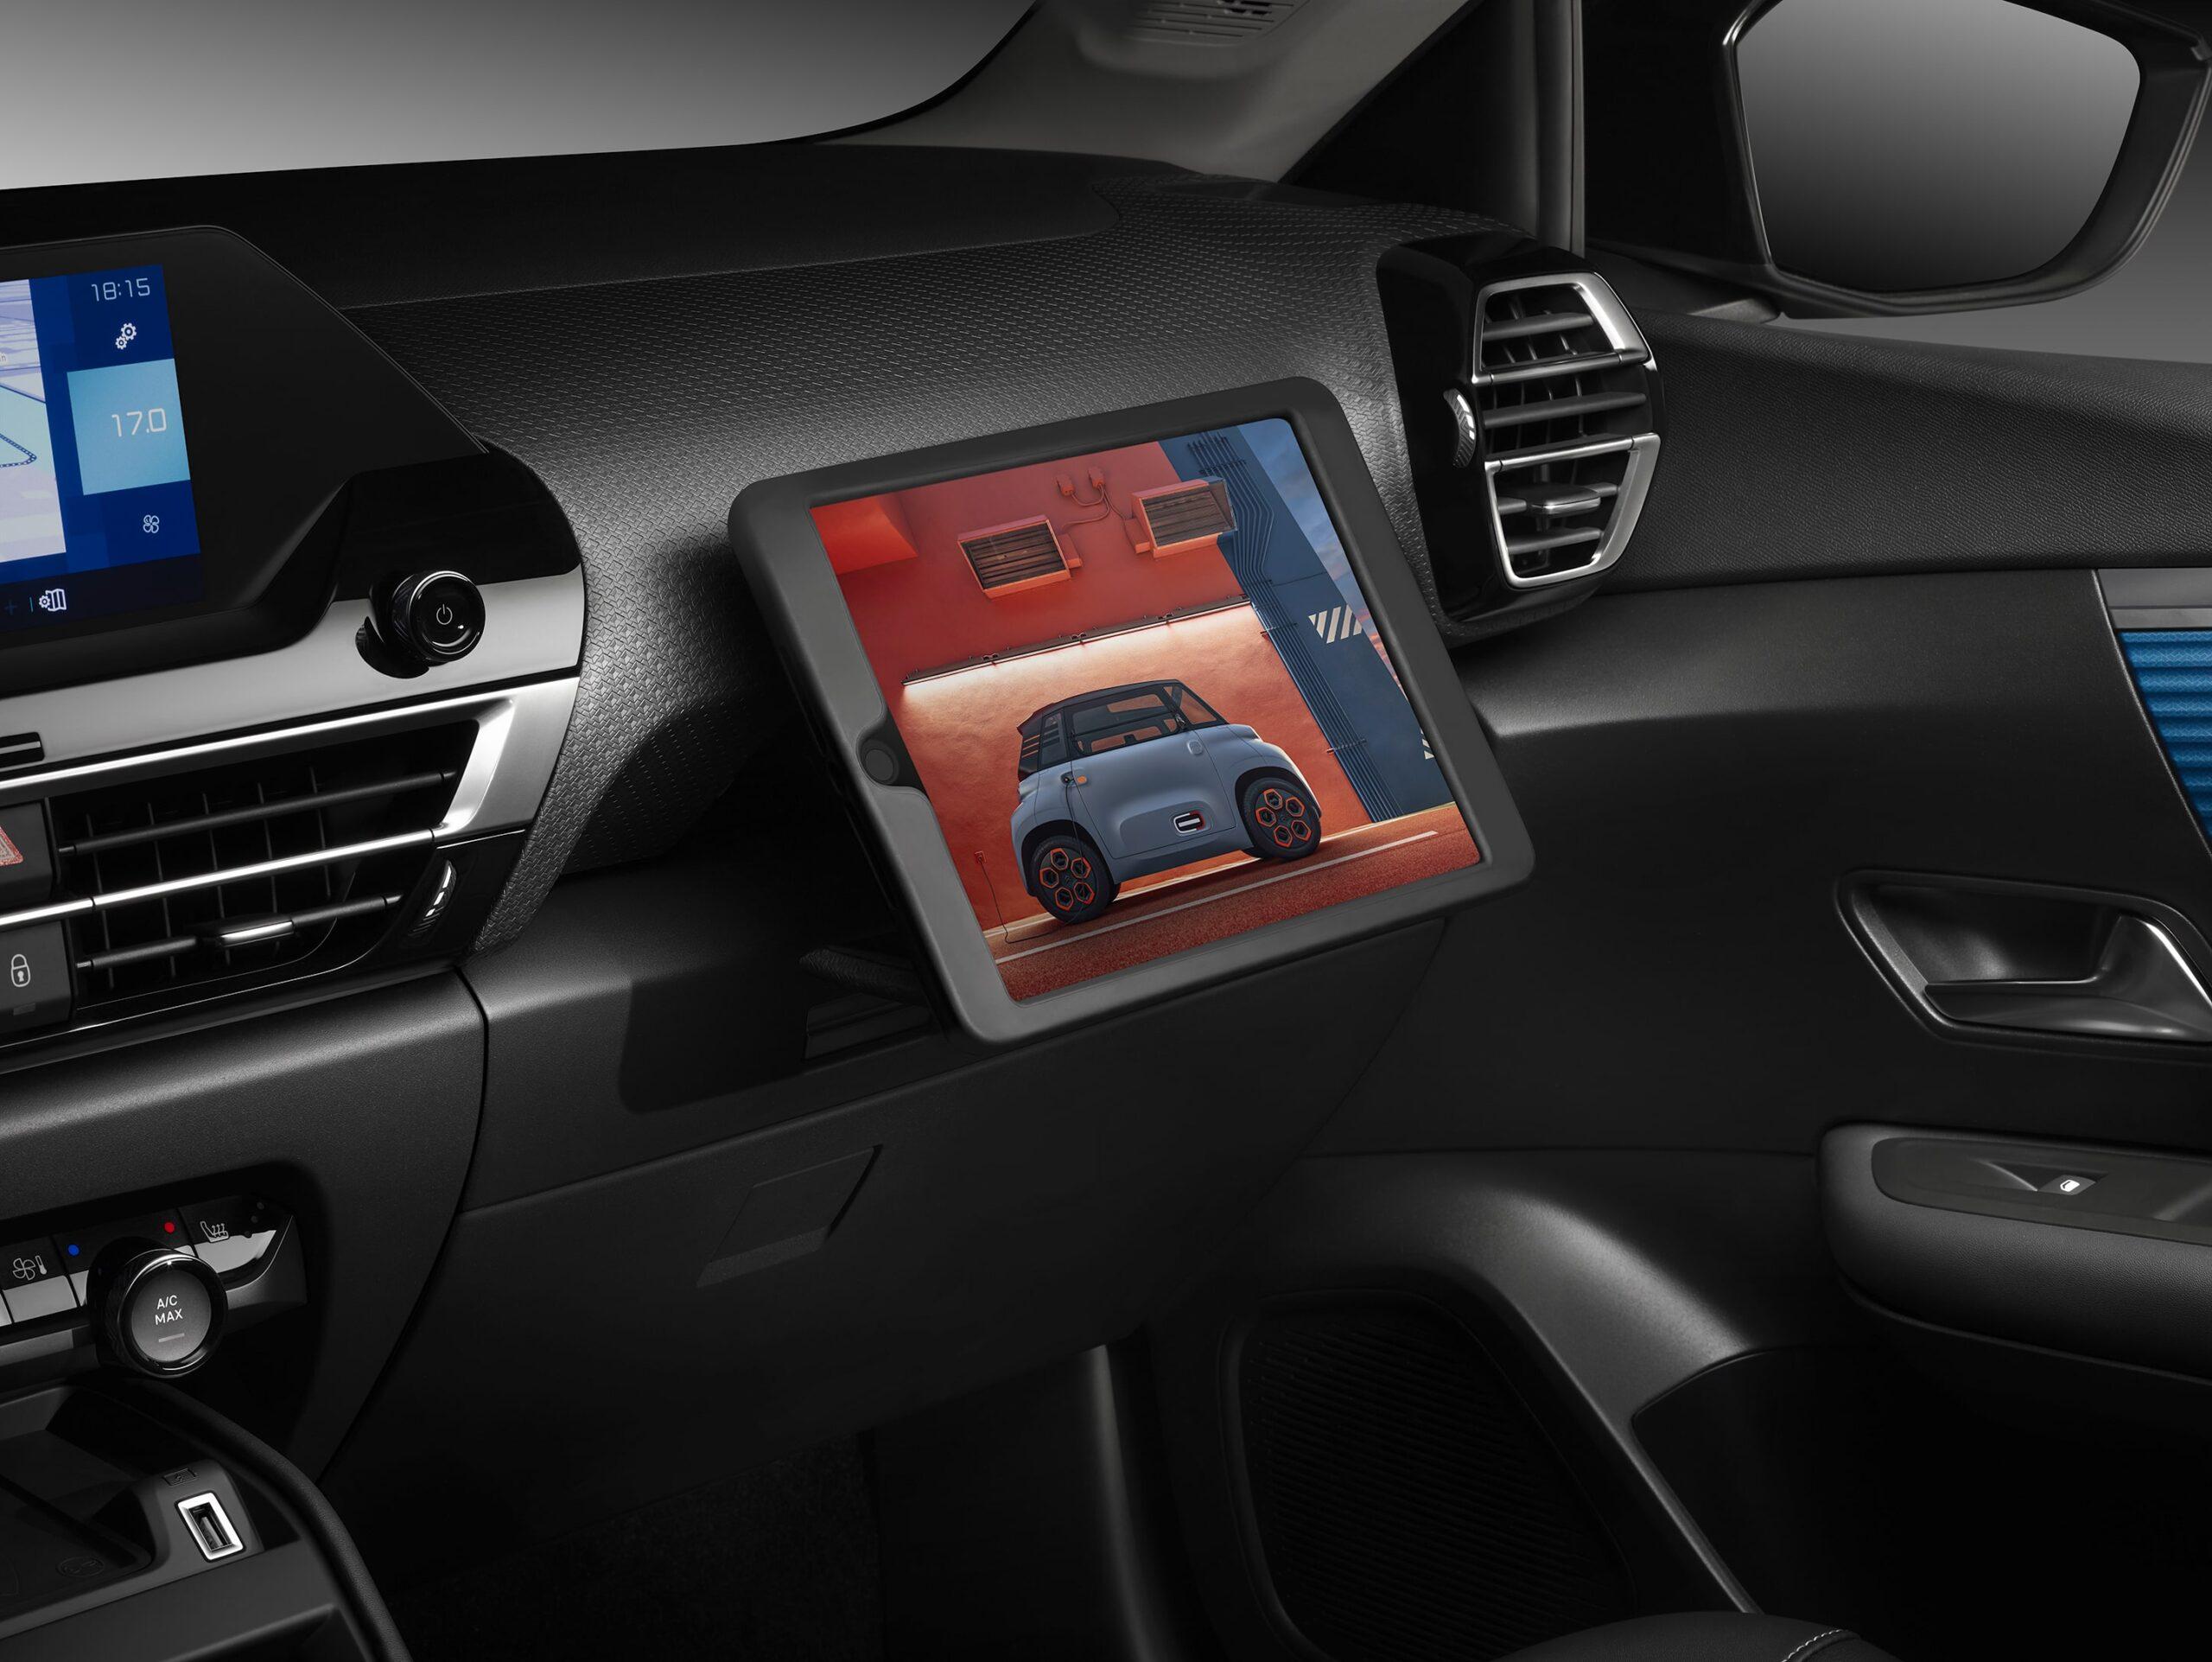 Nuova Citroën C4 Touch Pad